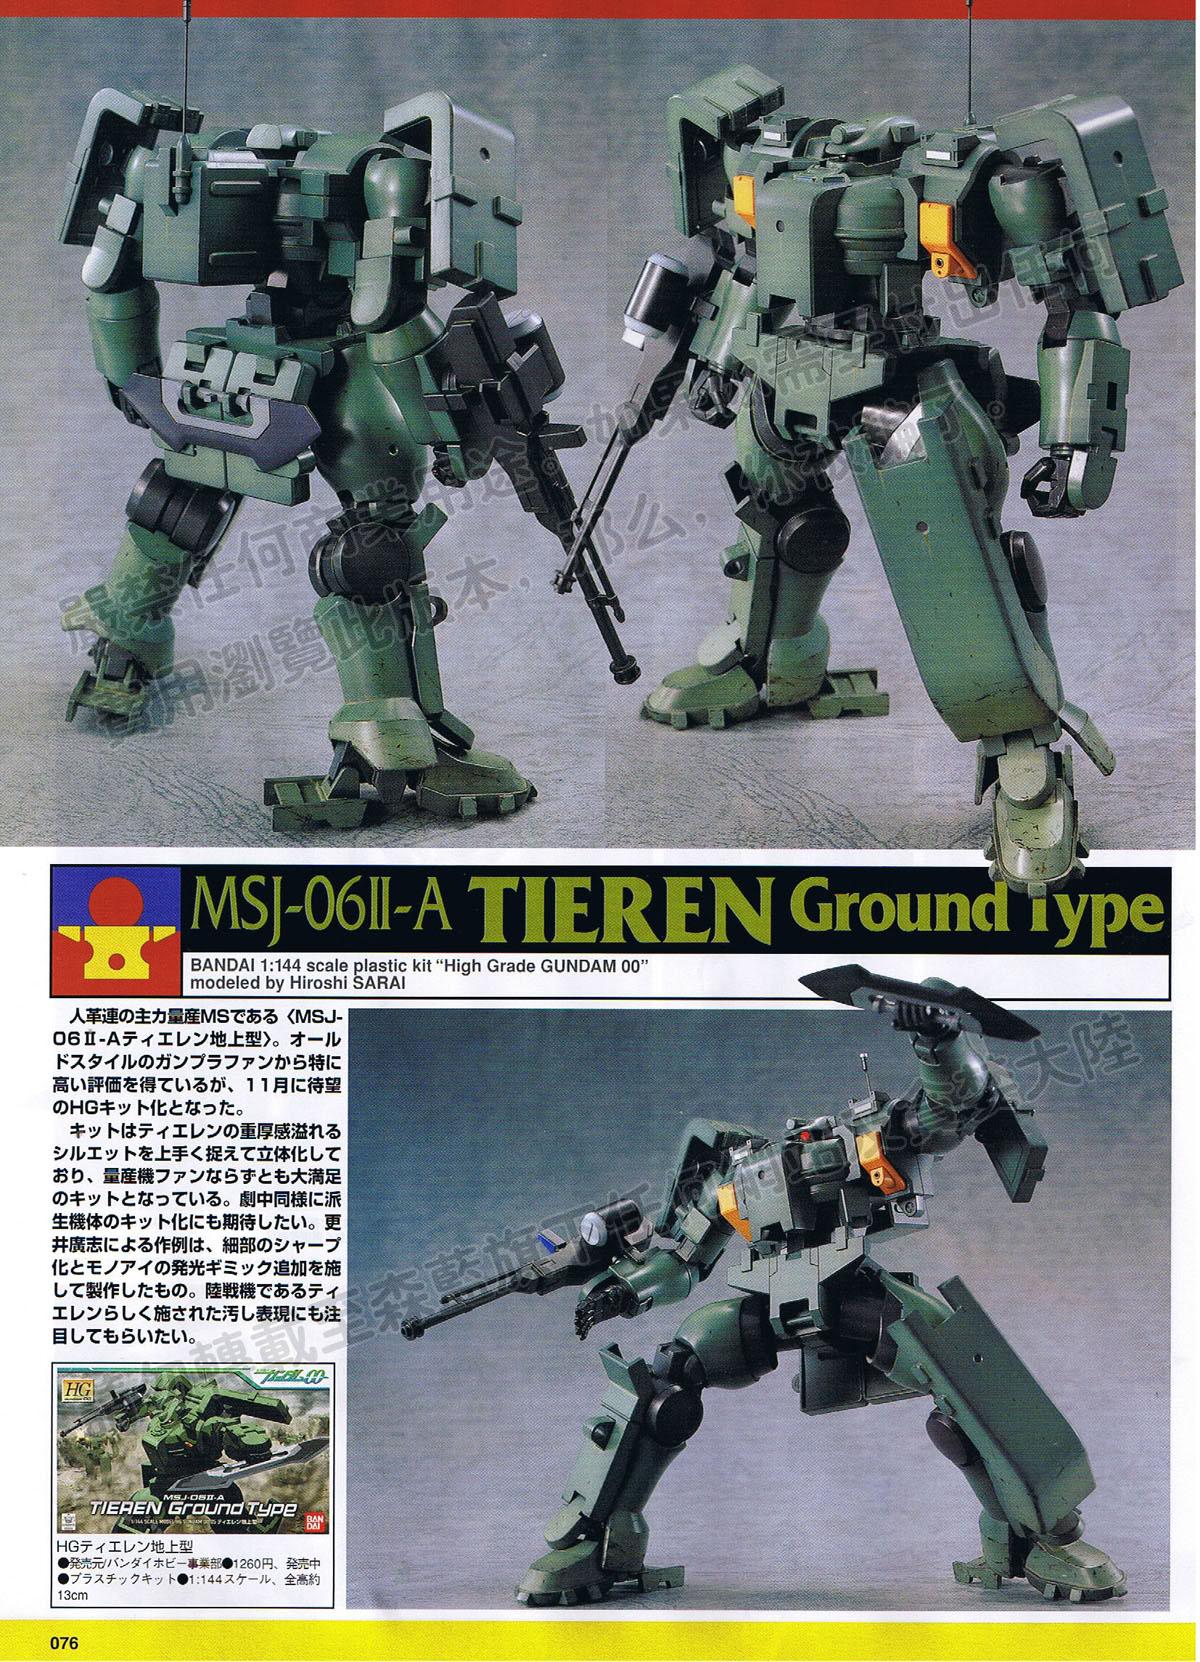 MSJ-06II-A Tieren Ground Type - The Gundam Wiki - Wikia